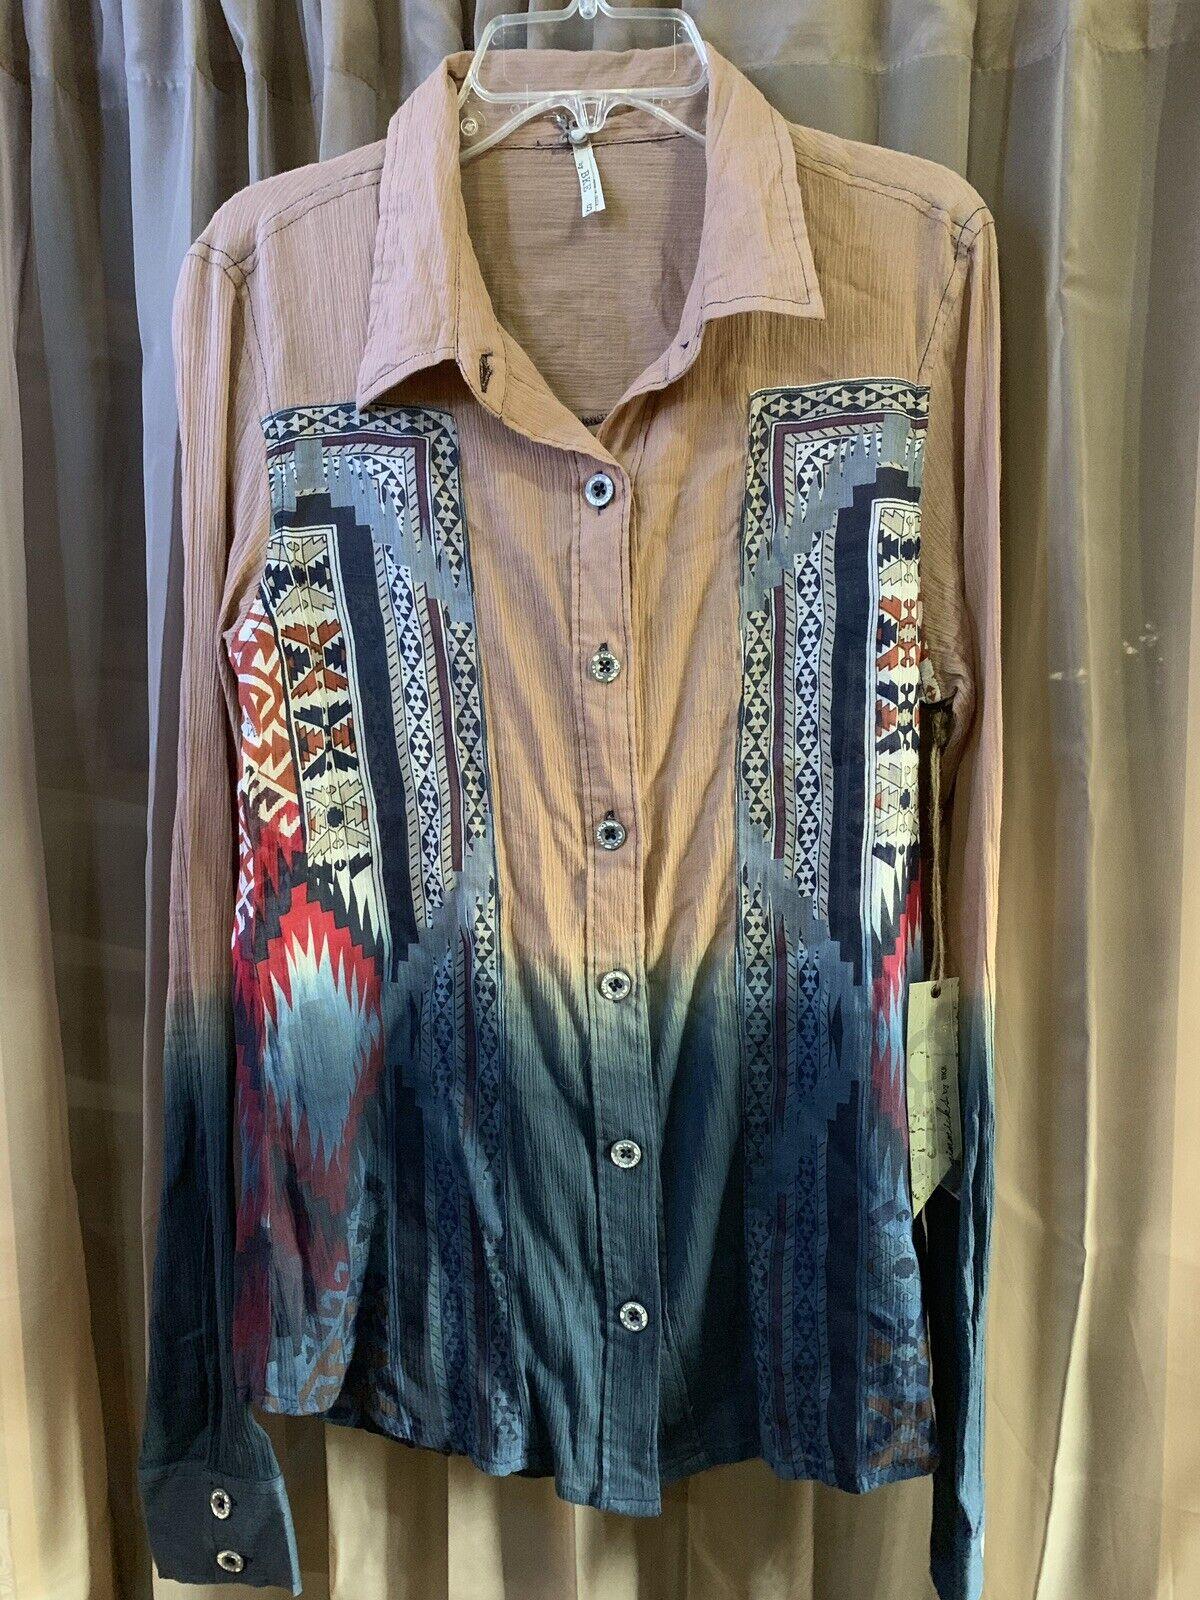 NWT Gimmicks By BKE damen's Blouse Long Sleeve Button Up Größe S